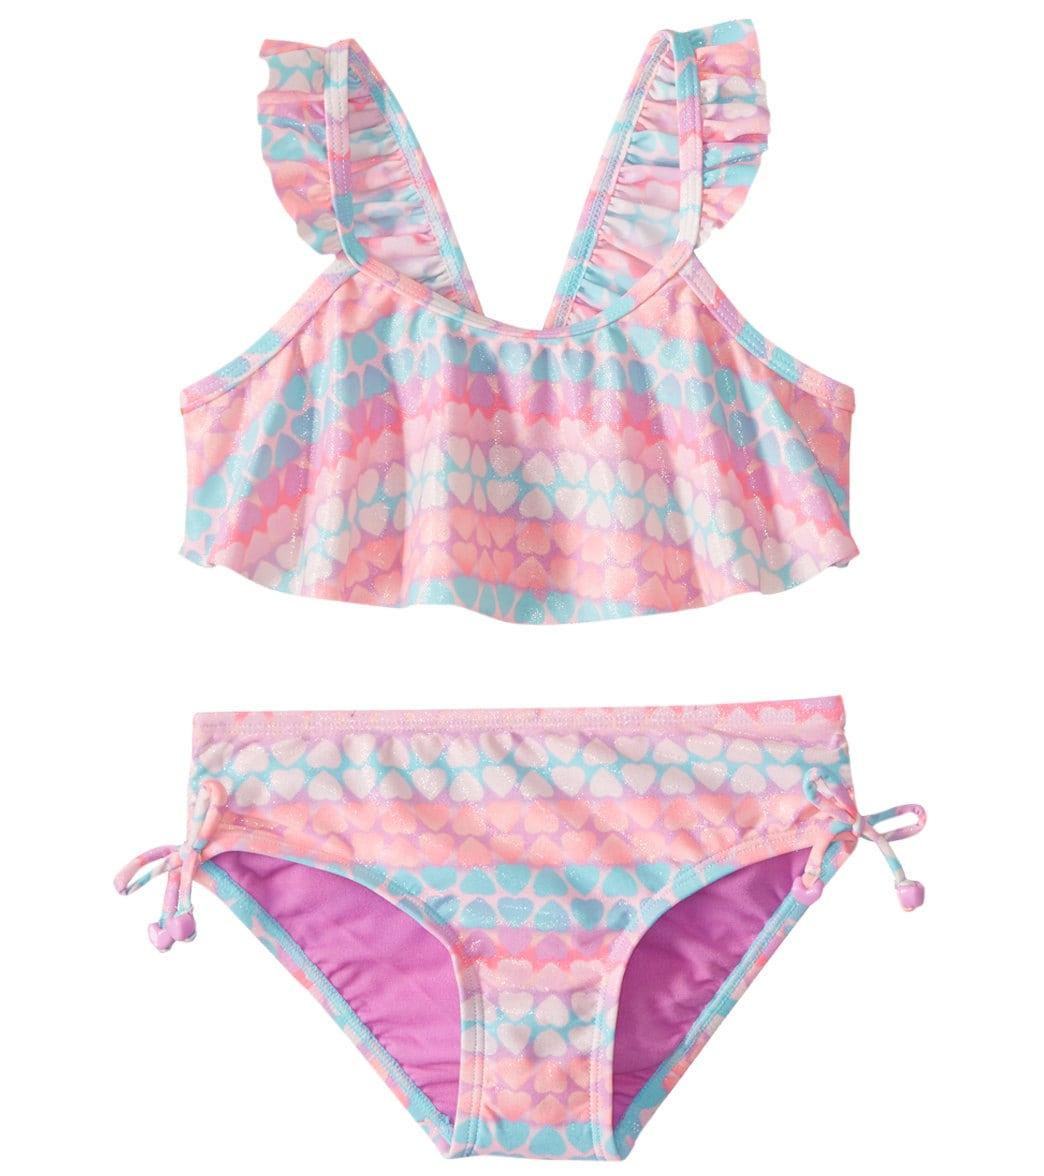 03a07204321f7 Hula Star Girls' Hearts Galore Two Piece Bikini (Toddler, Little Kid) at  SwimOutlet.com